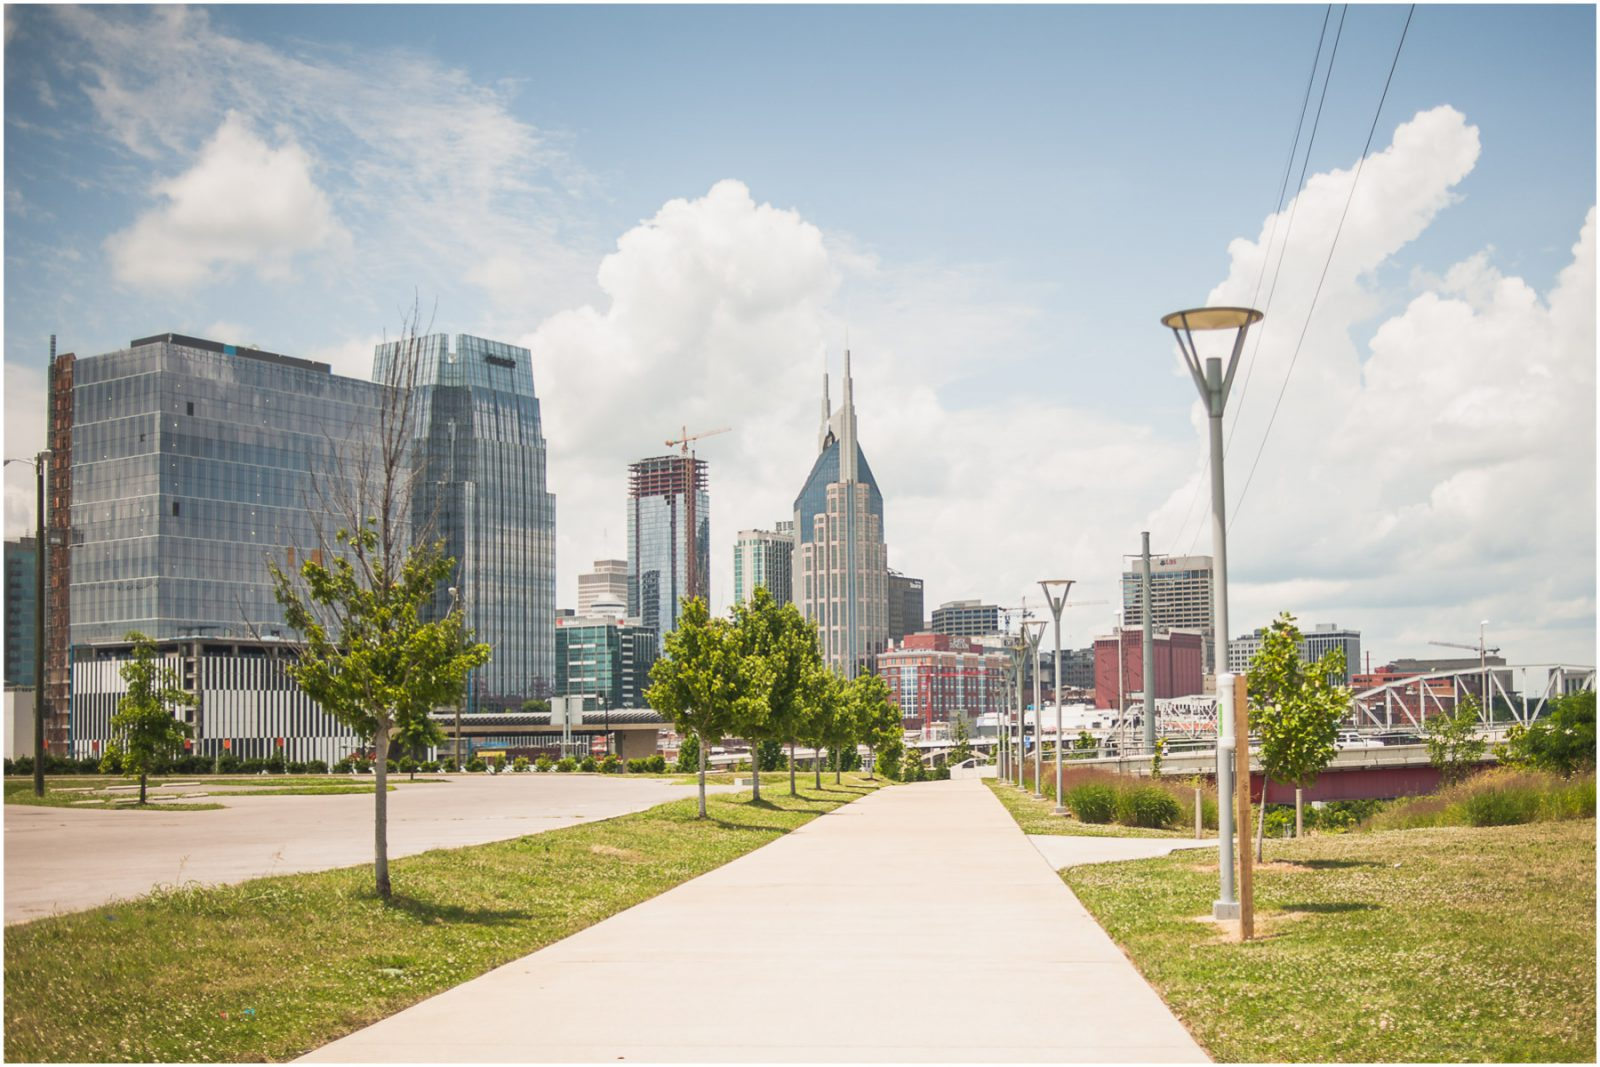 Nashville_TN_DAY-2_9.jpg